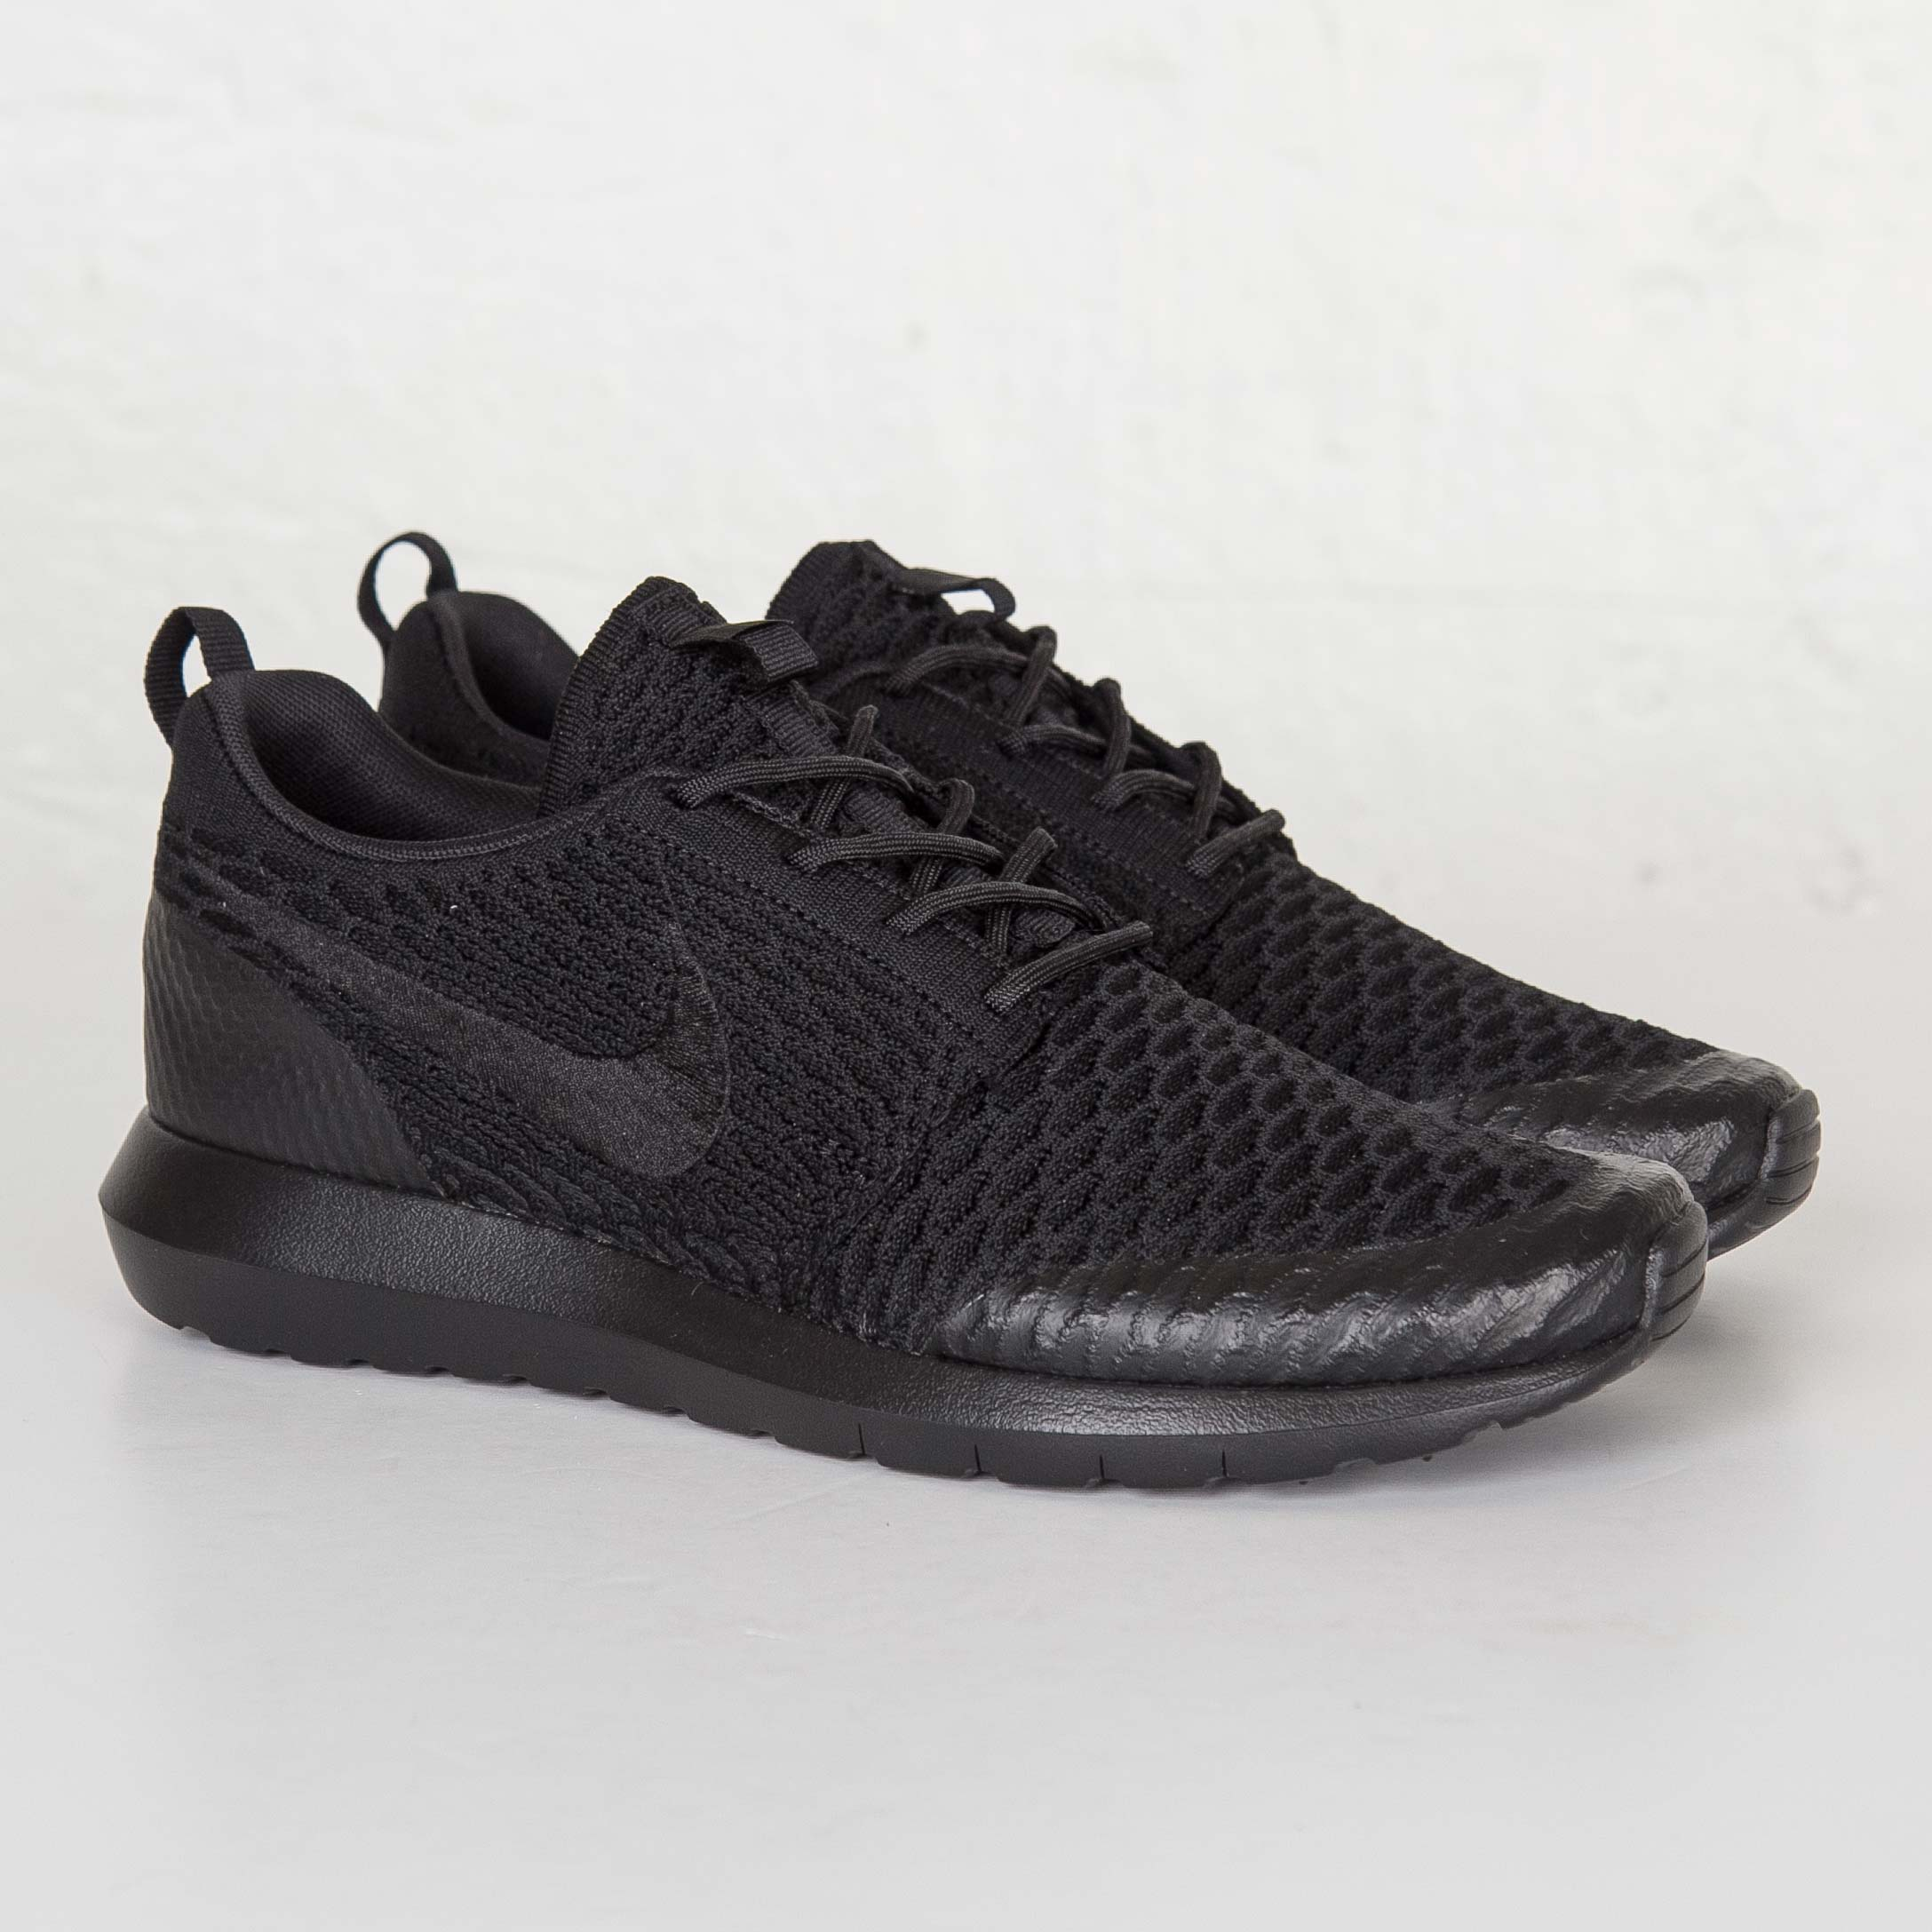 pretty nice 3bdd8 2a3f4 Nike Roshe NM Flyknit se